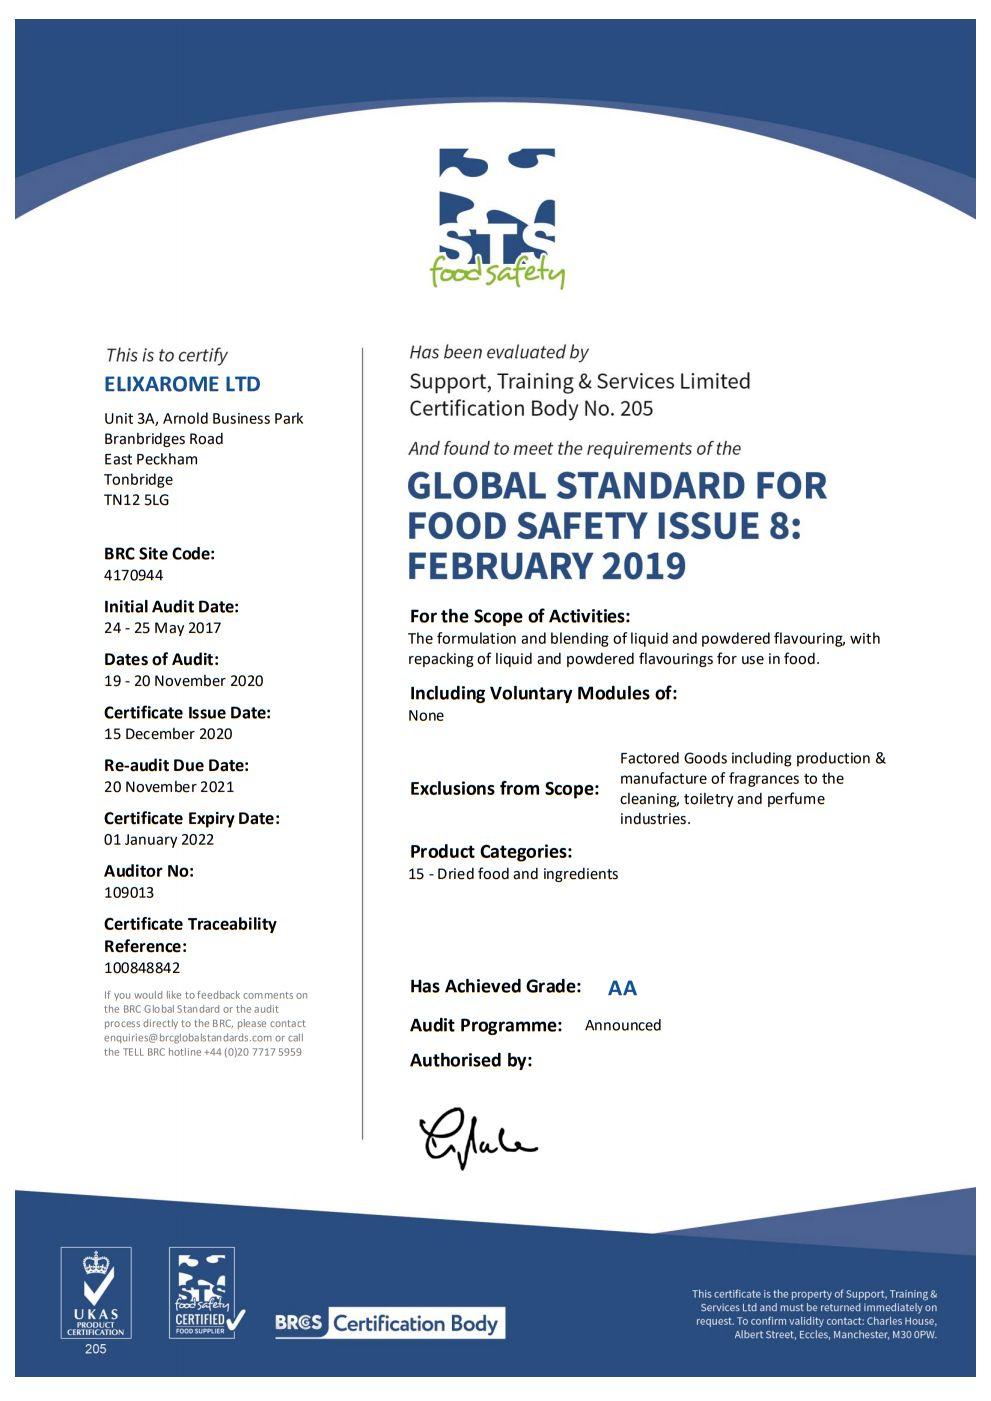 BRCGS Food CV Certification Extension Certificate